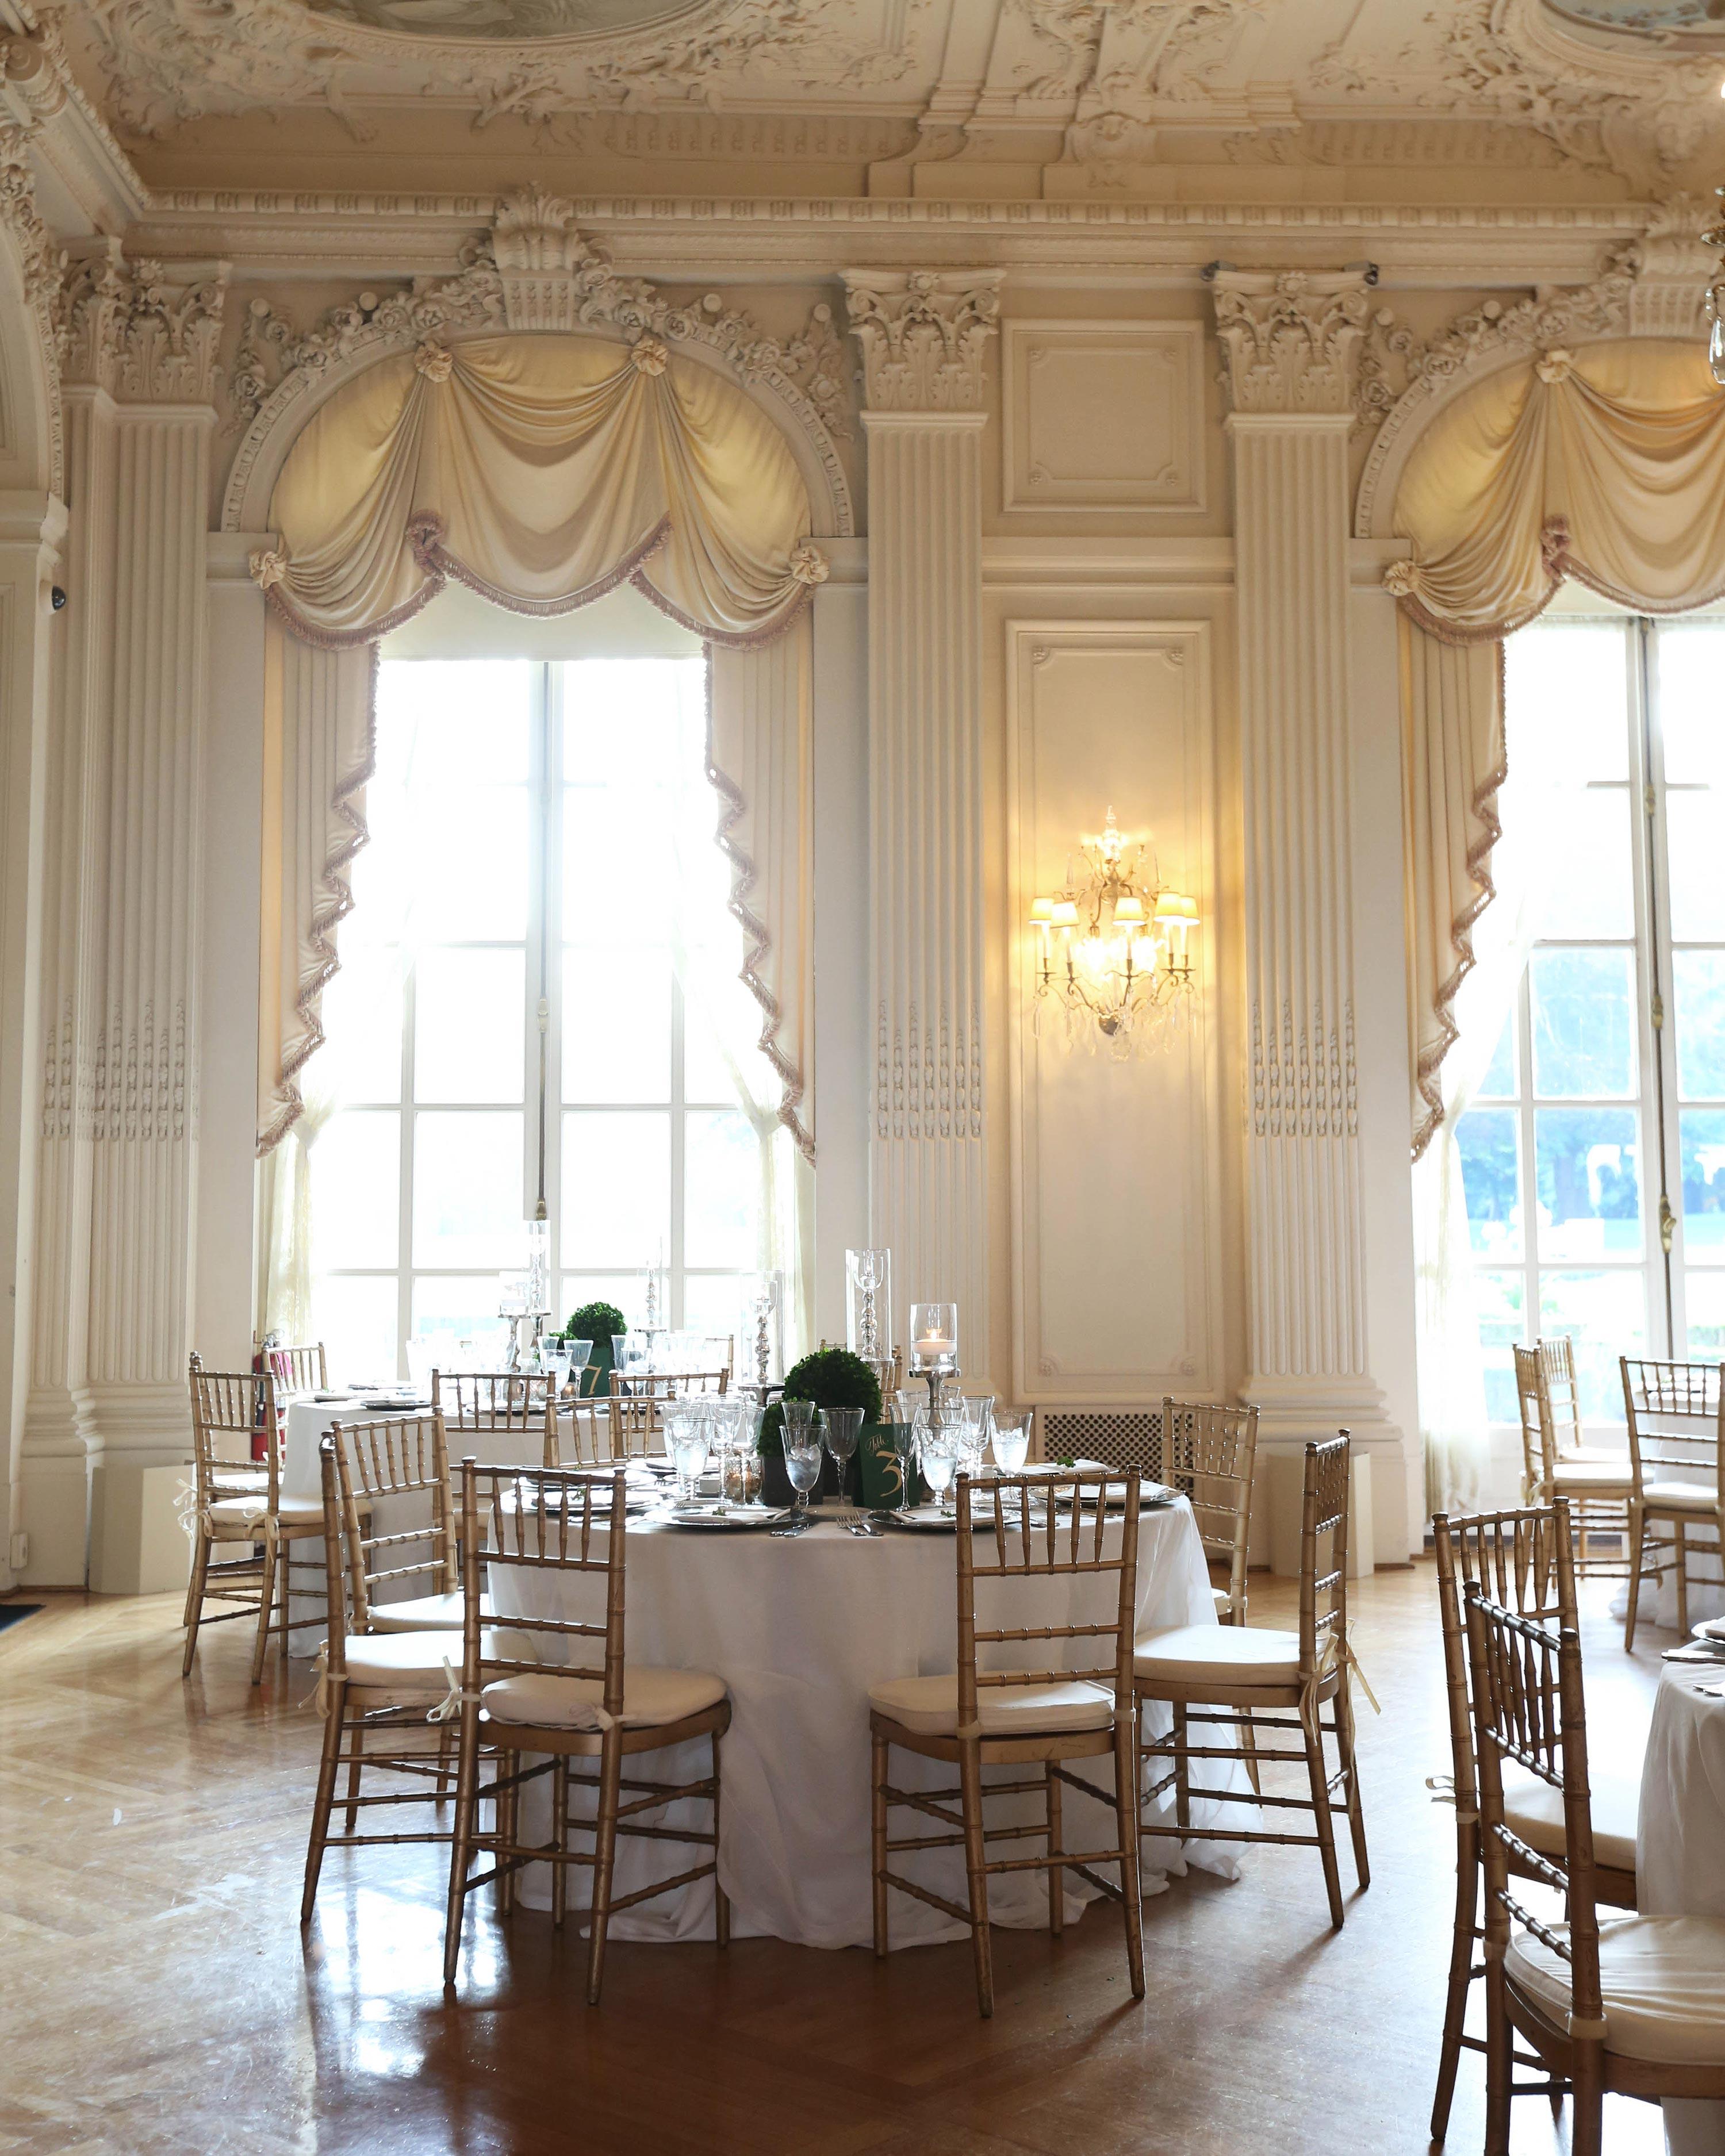 lissy-steven-wedding-newport-ballroom-226-elizabethmessina-s112907-0516.jpg